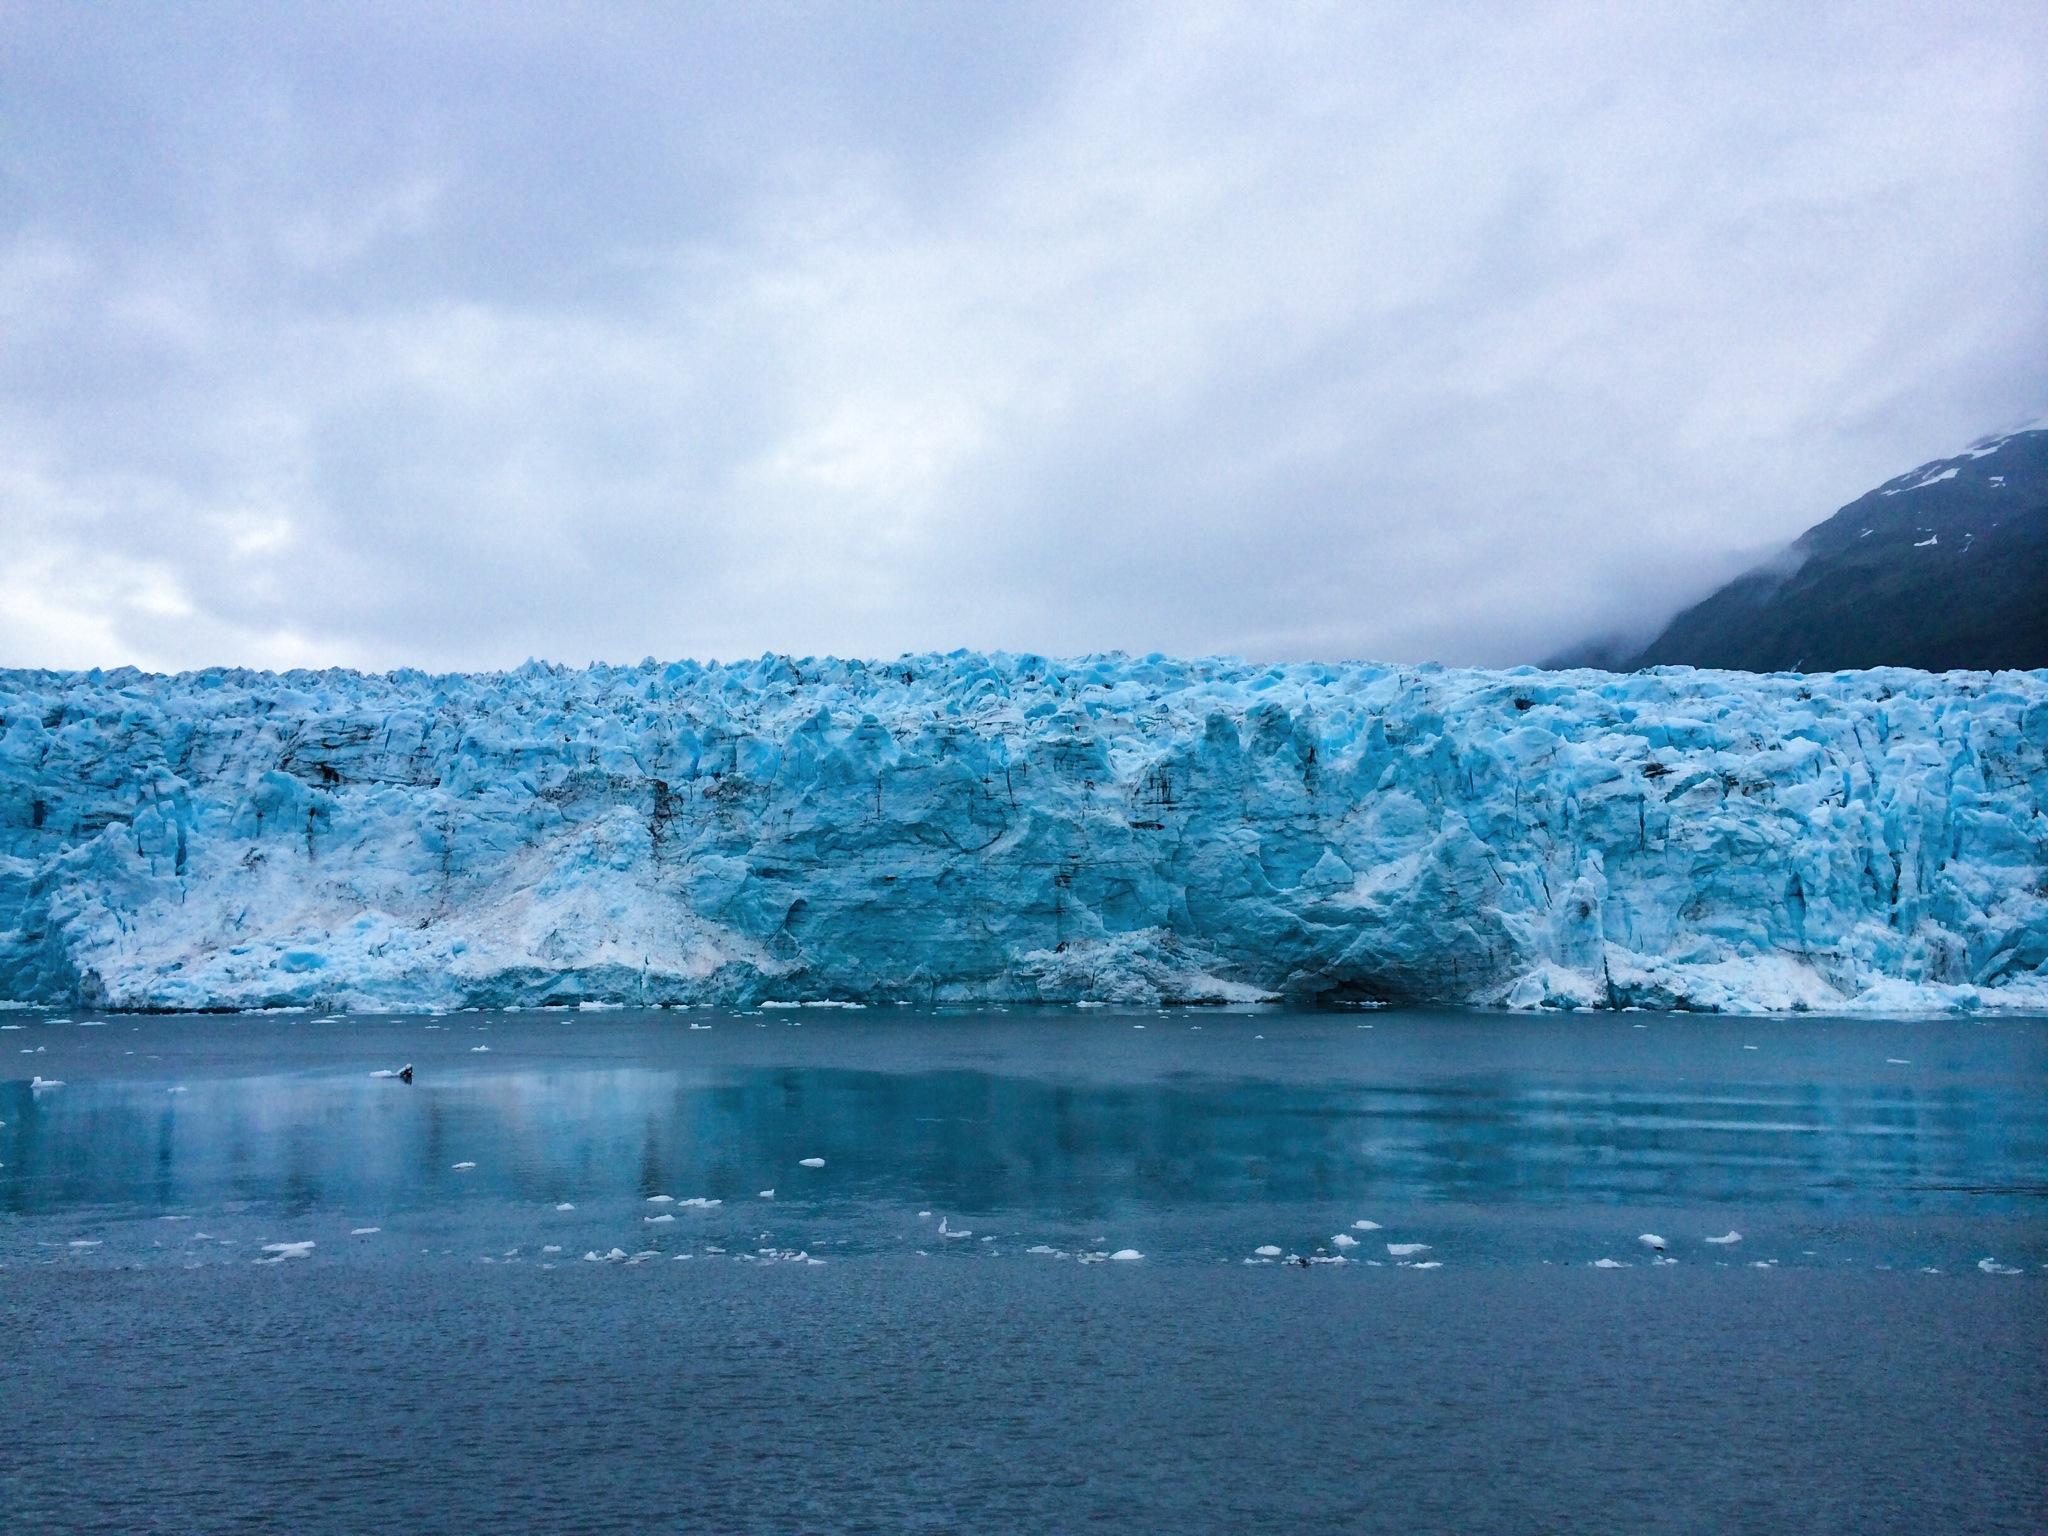 Crystalline blue showing through